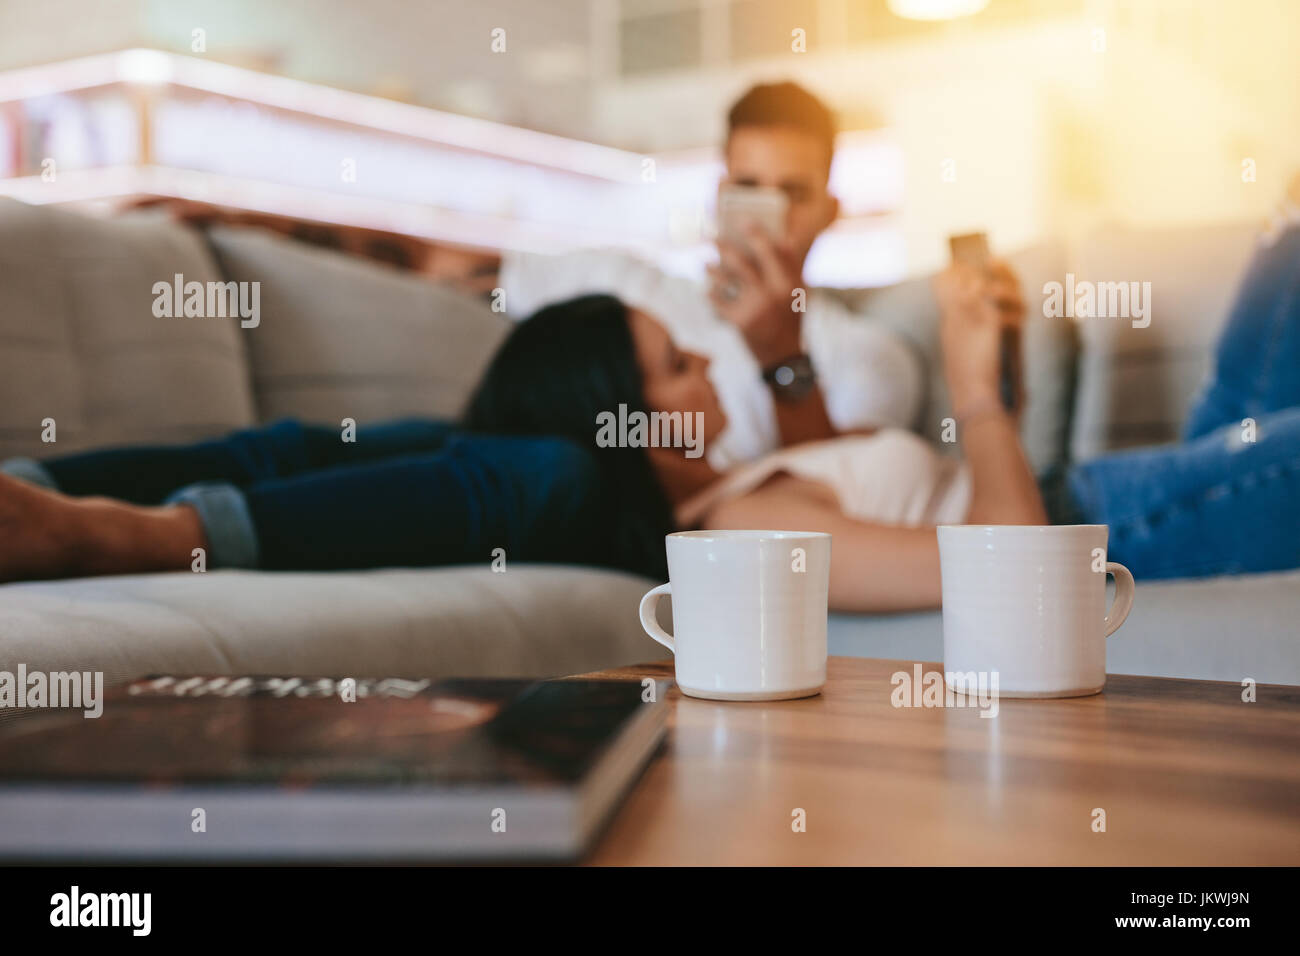 Dos tazas de café en la mesa con la pareja de relax en antecedentes sobre un sofá. Tazas de café Imagen De Stock